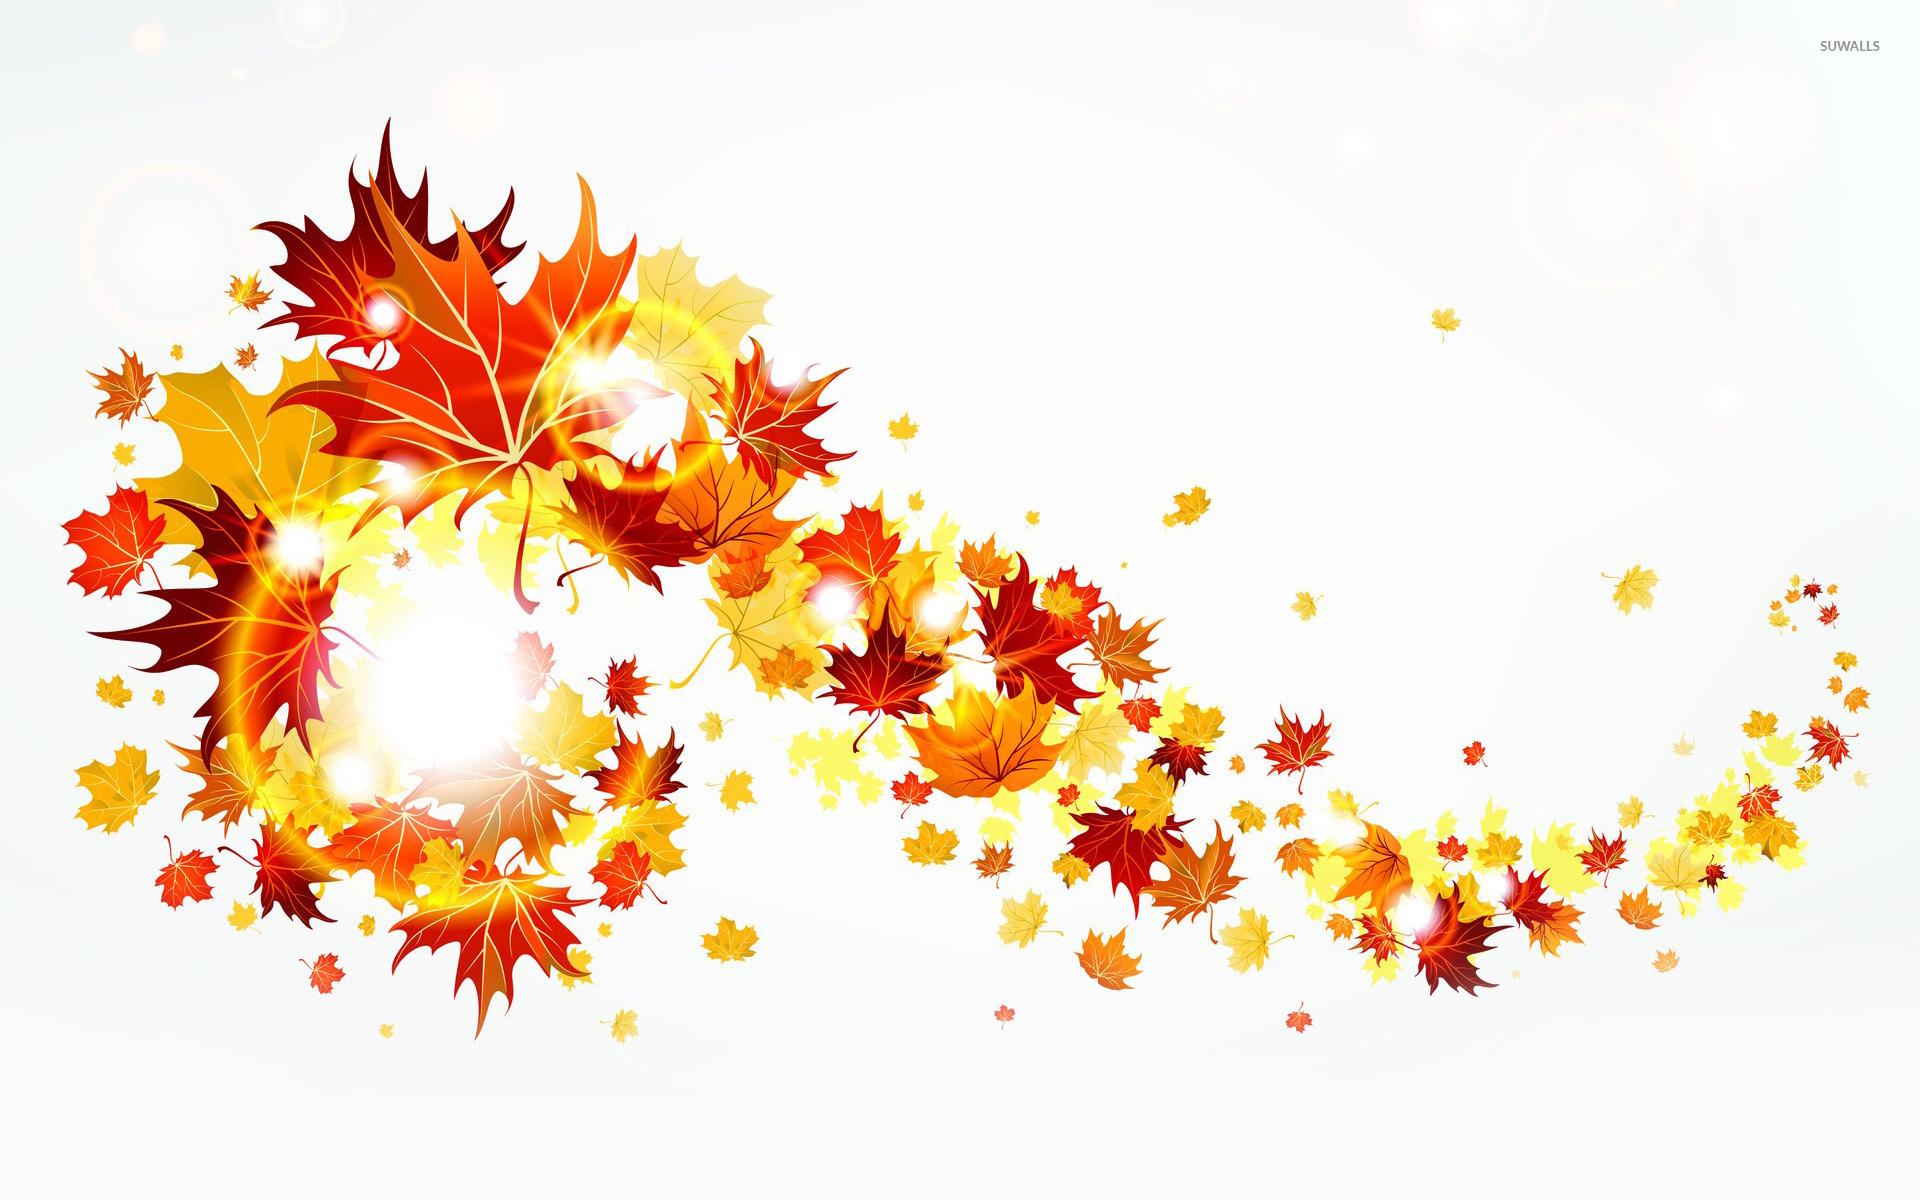 Free Desktop Wallpaper Fall Season Autumn Leaves 2 Wallpaper Vector Wallpapers 20413